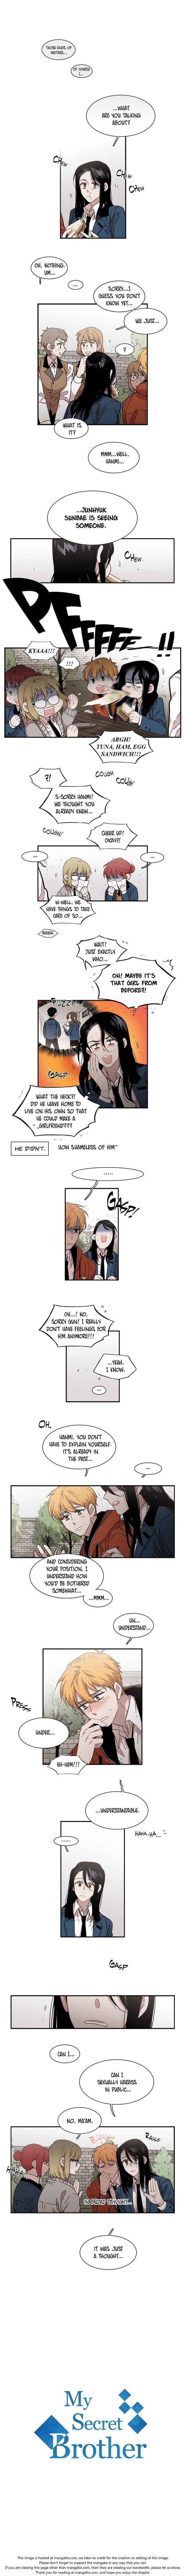 Unstoppable Siblings 110: He Has a Weak Heart at MangaFox.la